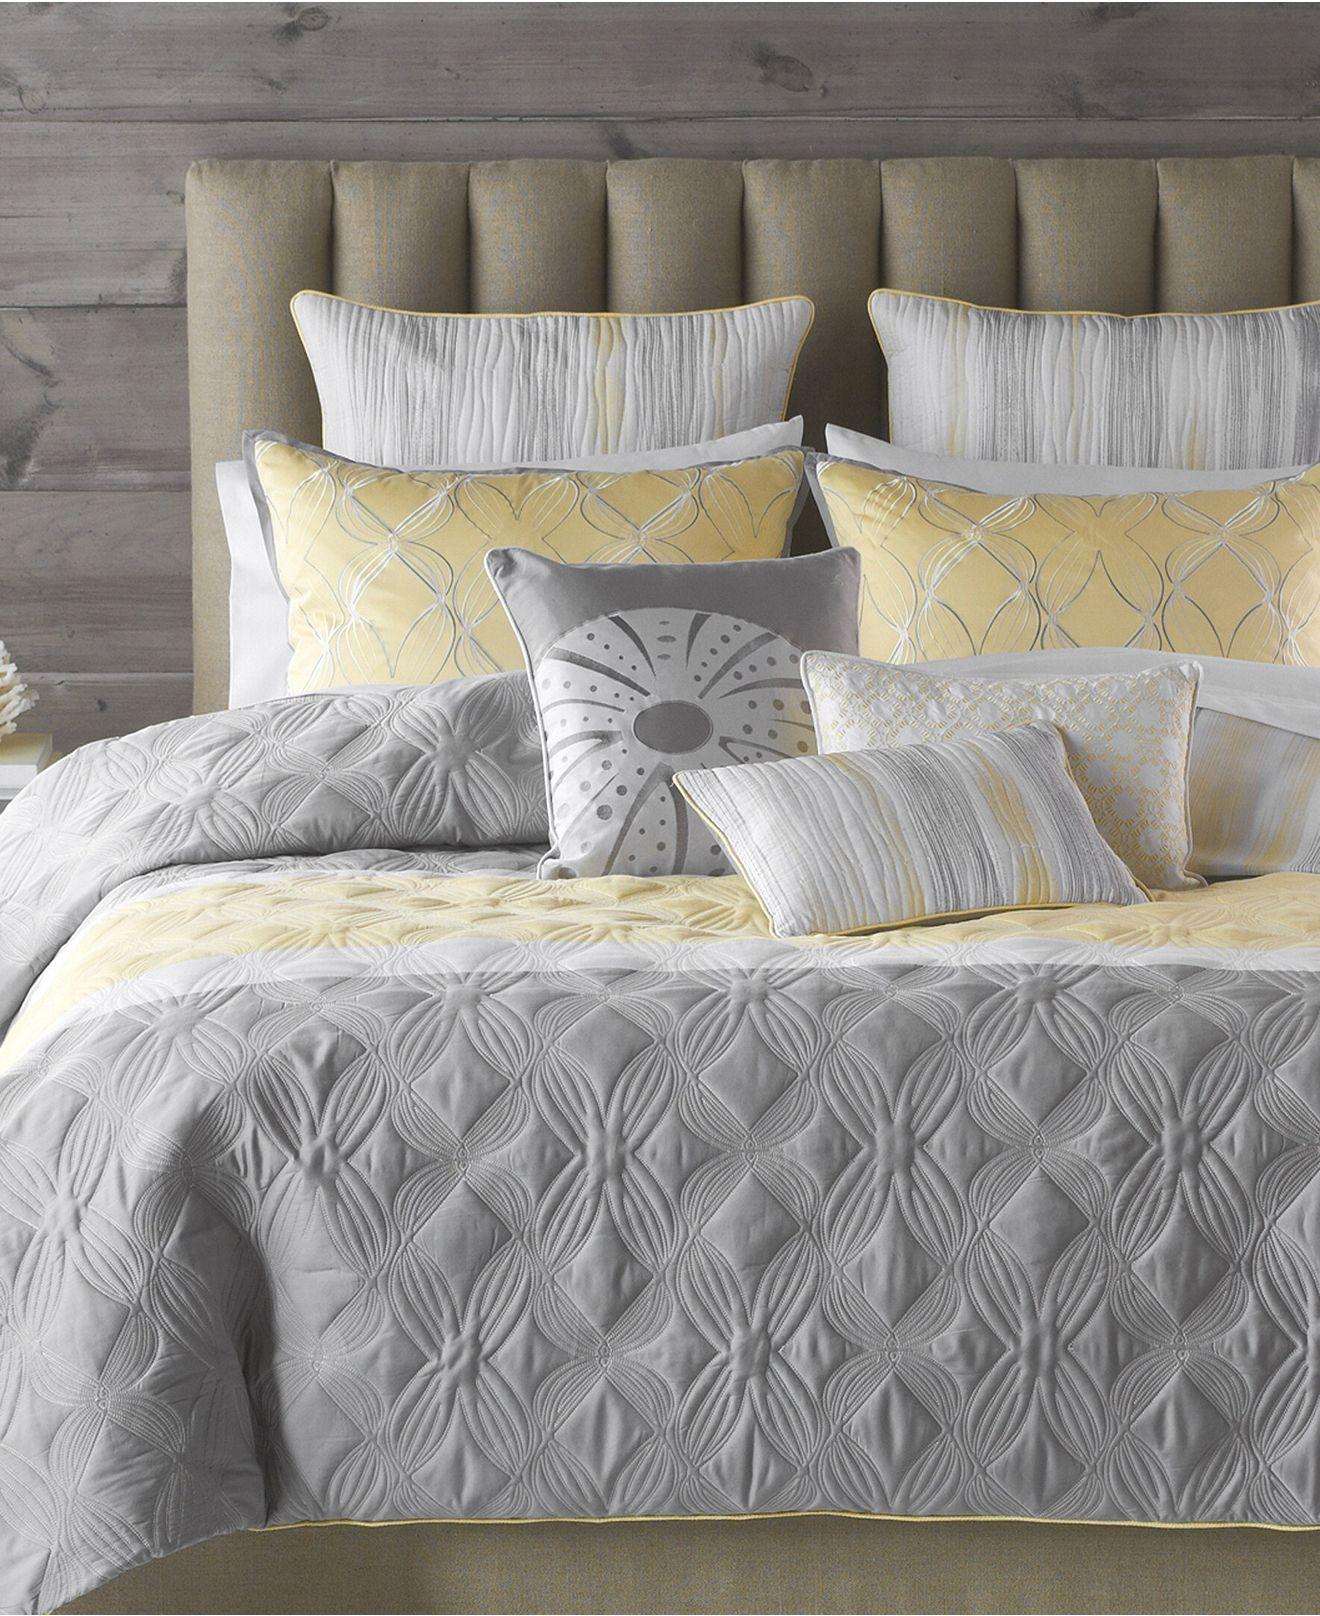 Bedroom Decor Gray And Yellow Macys Bedroom Sets Bedroom Colors Design Bedroom Colors Tumblr: Bryan Keith Bedding, Tango 9 Piece Comforter Sets